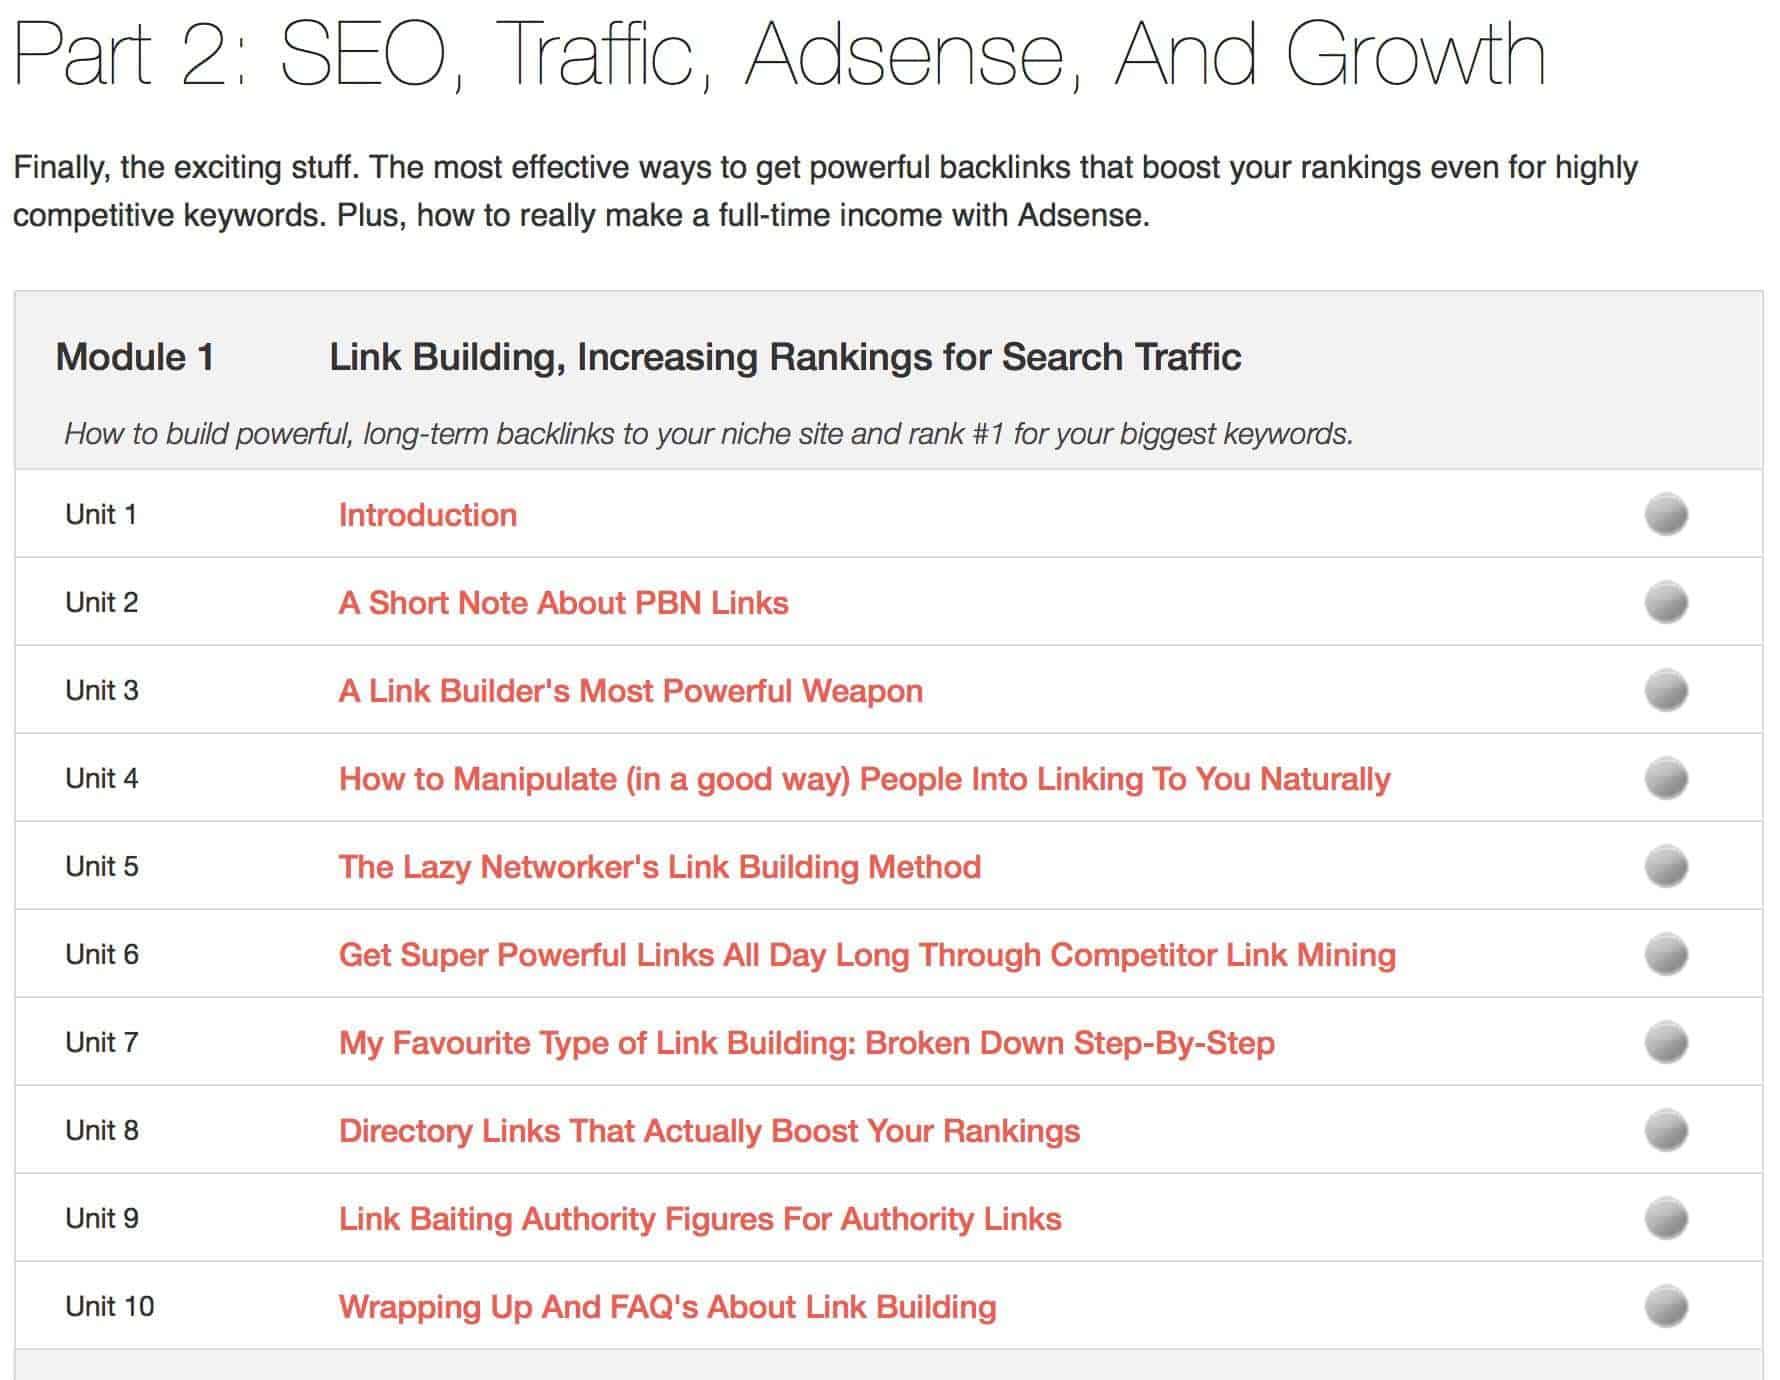 Dating site adsense earnings